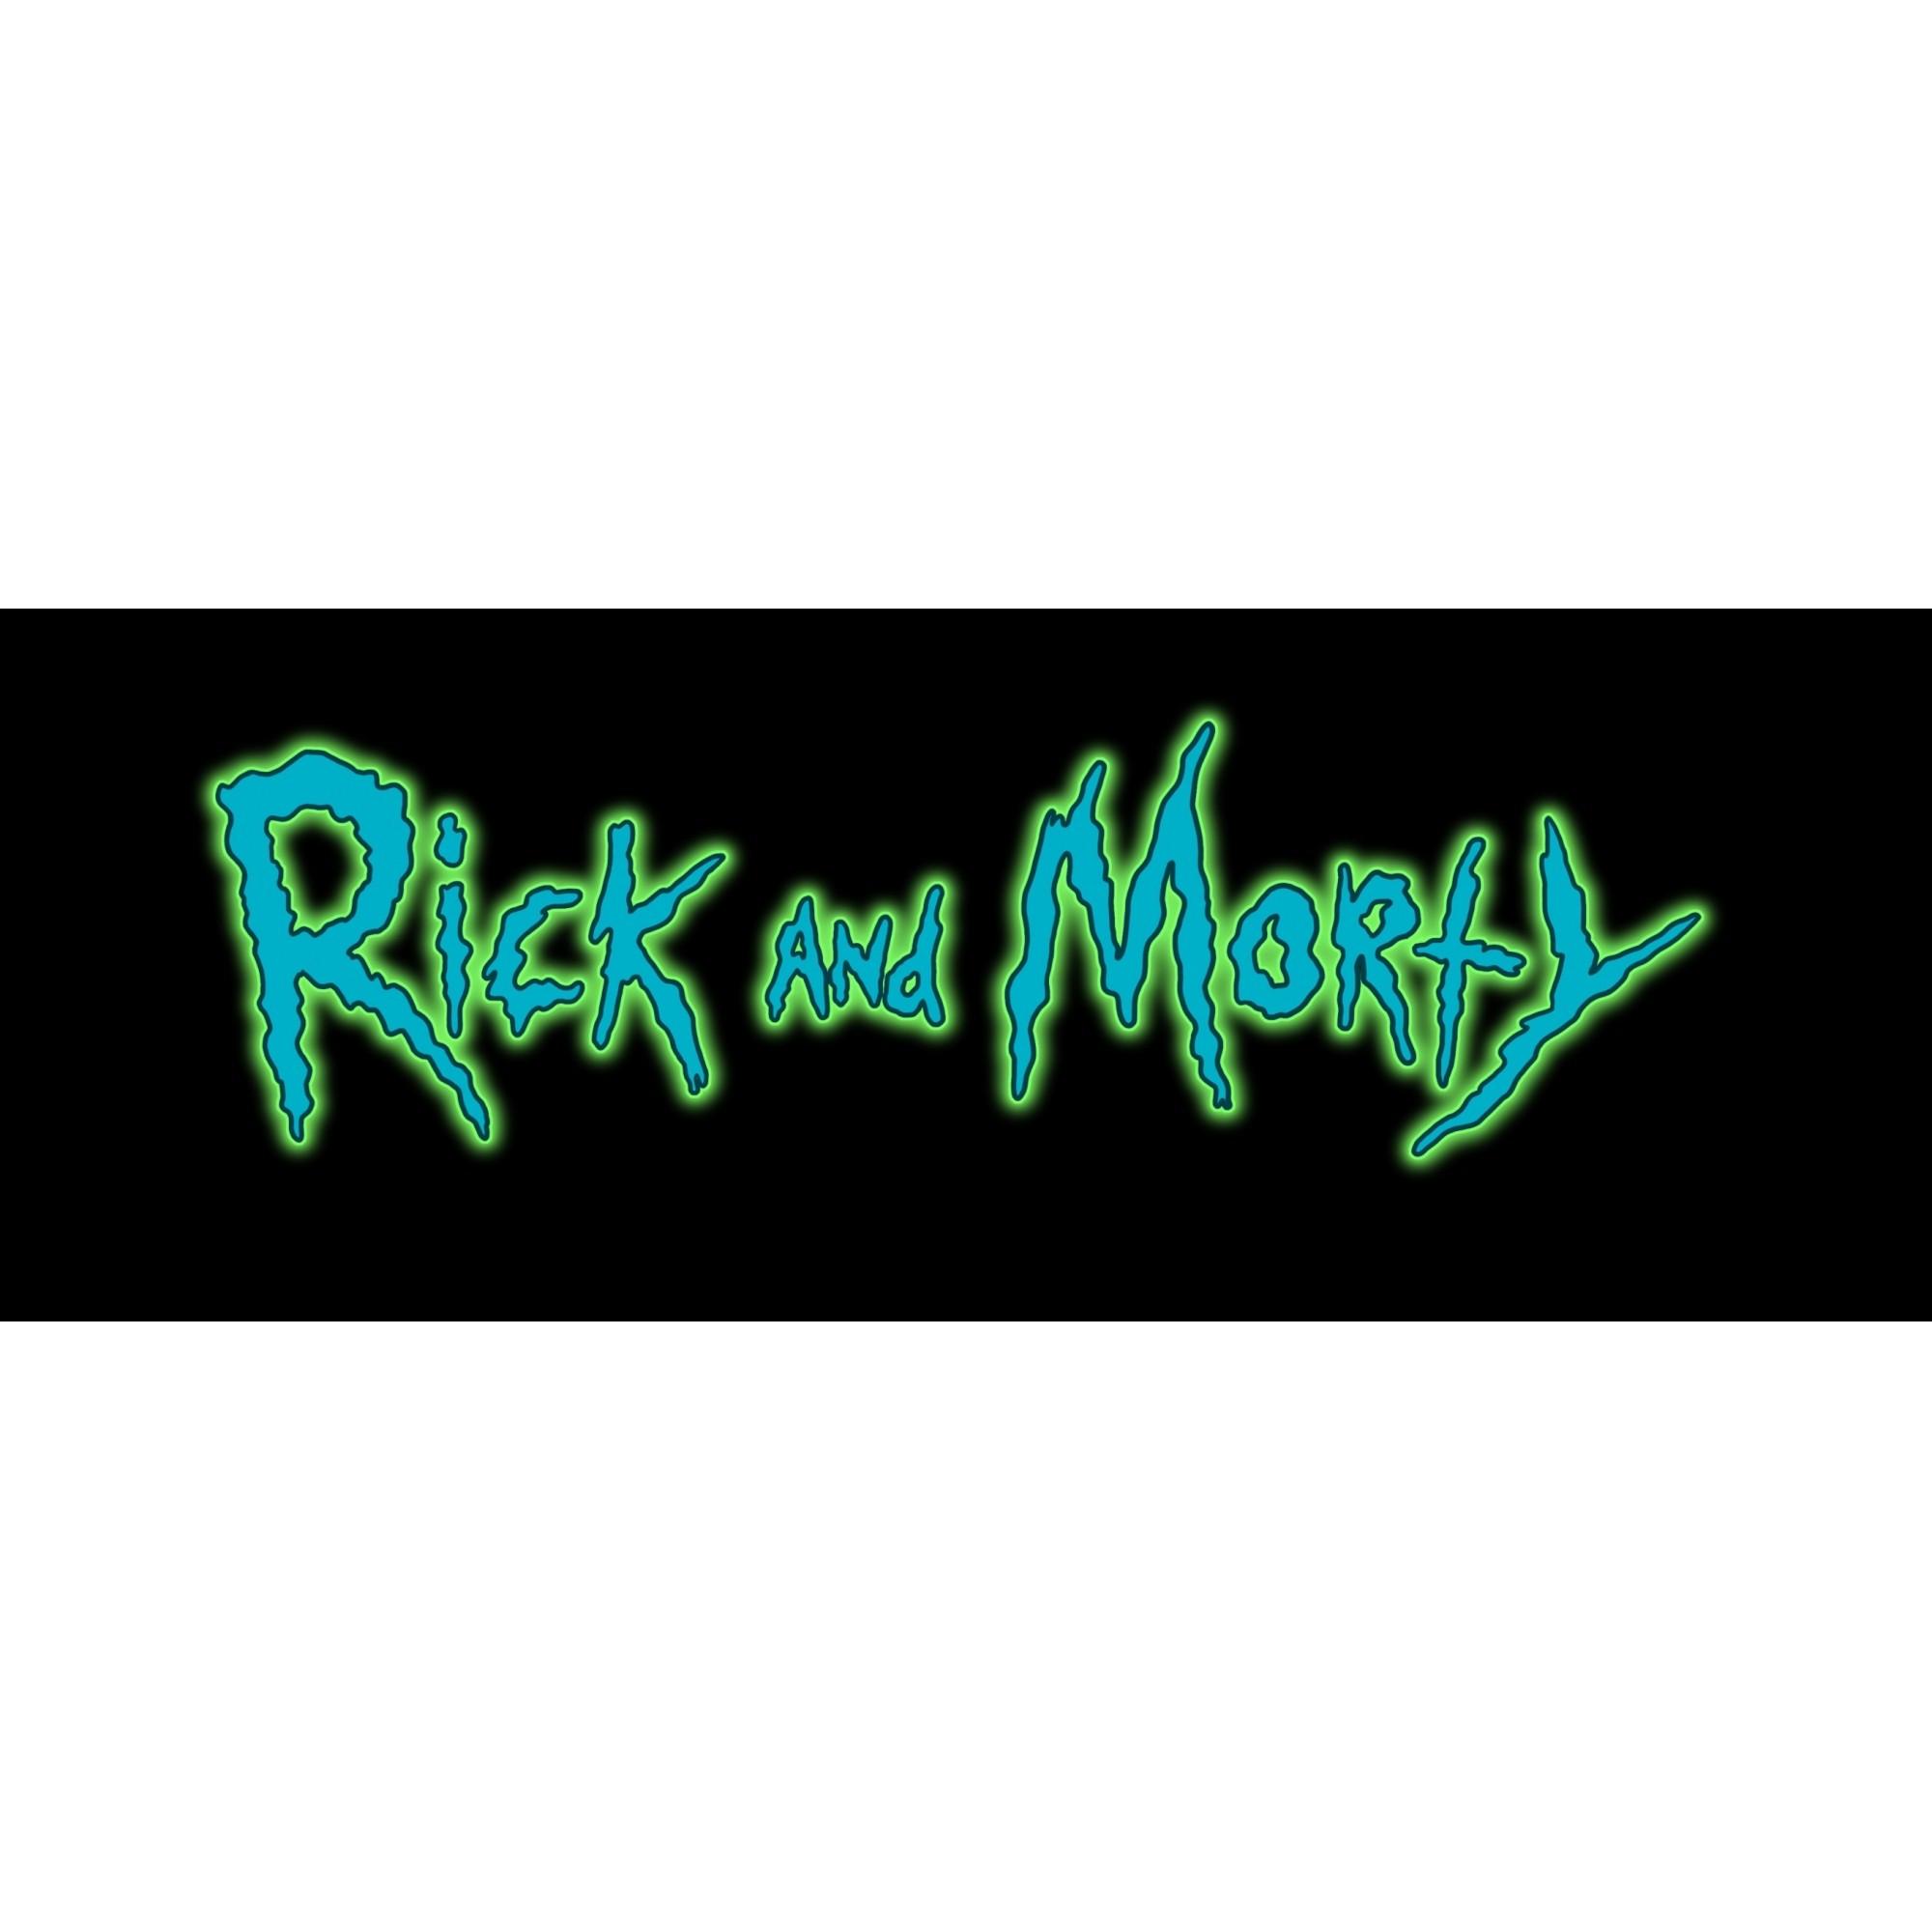 Camiseta Rick and Morty Cadeia: Rick Morty